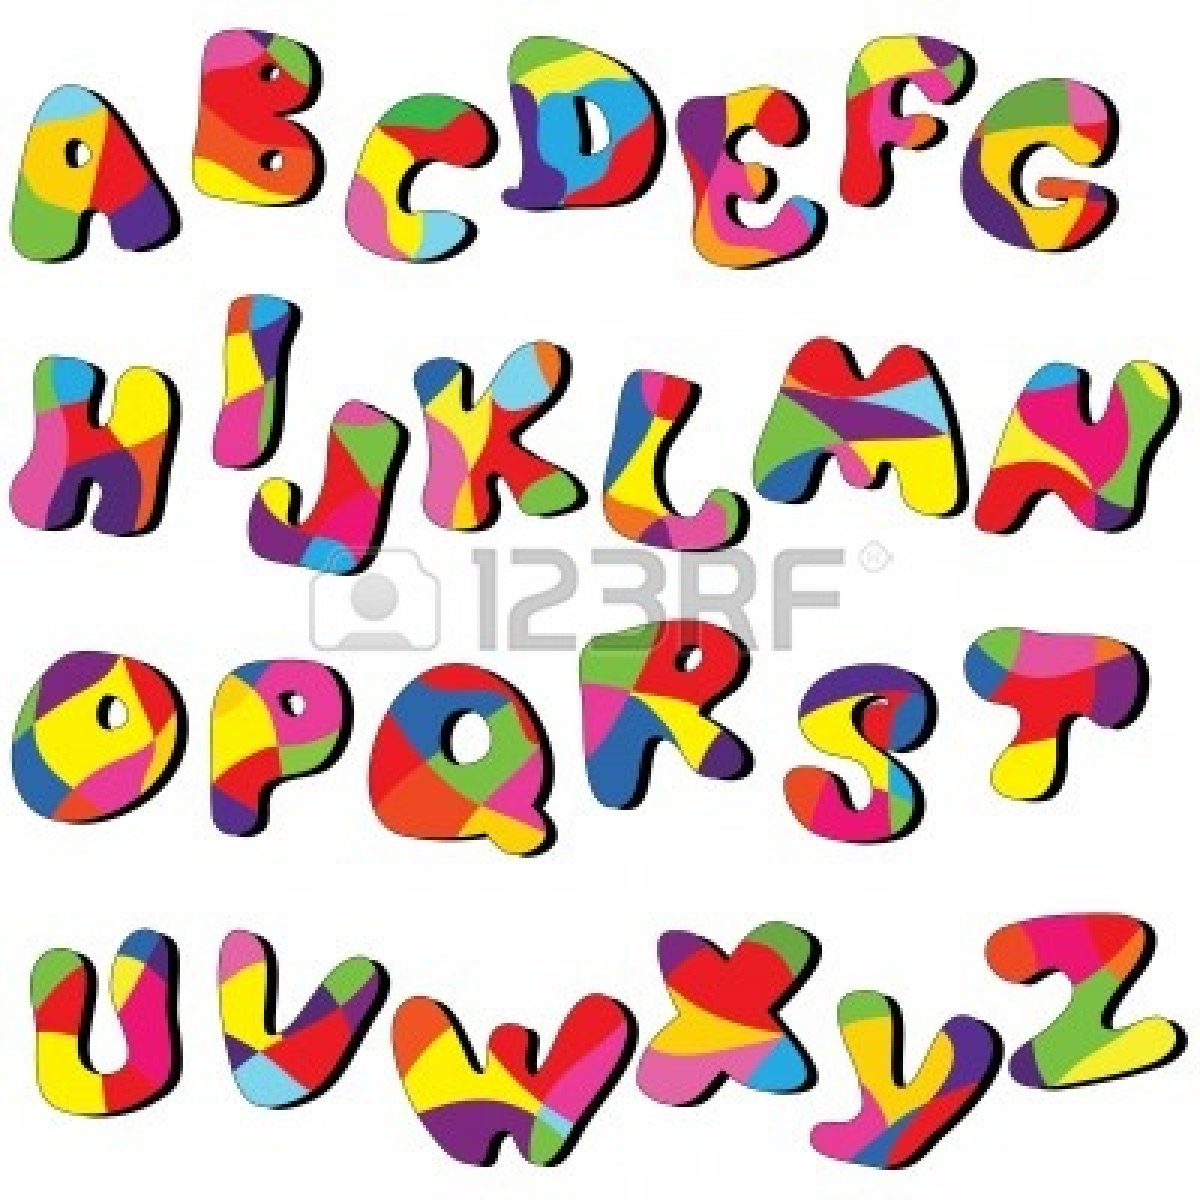 Alphabet Clipart For Kids | Clipart Panda - Free Clipart Images